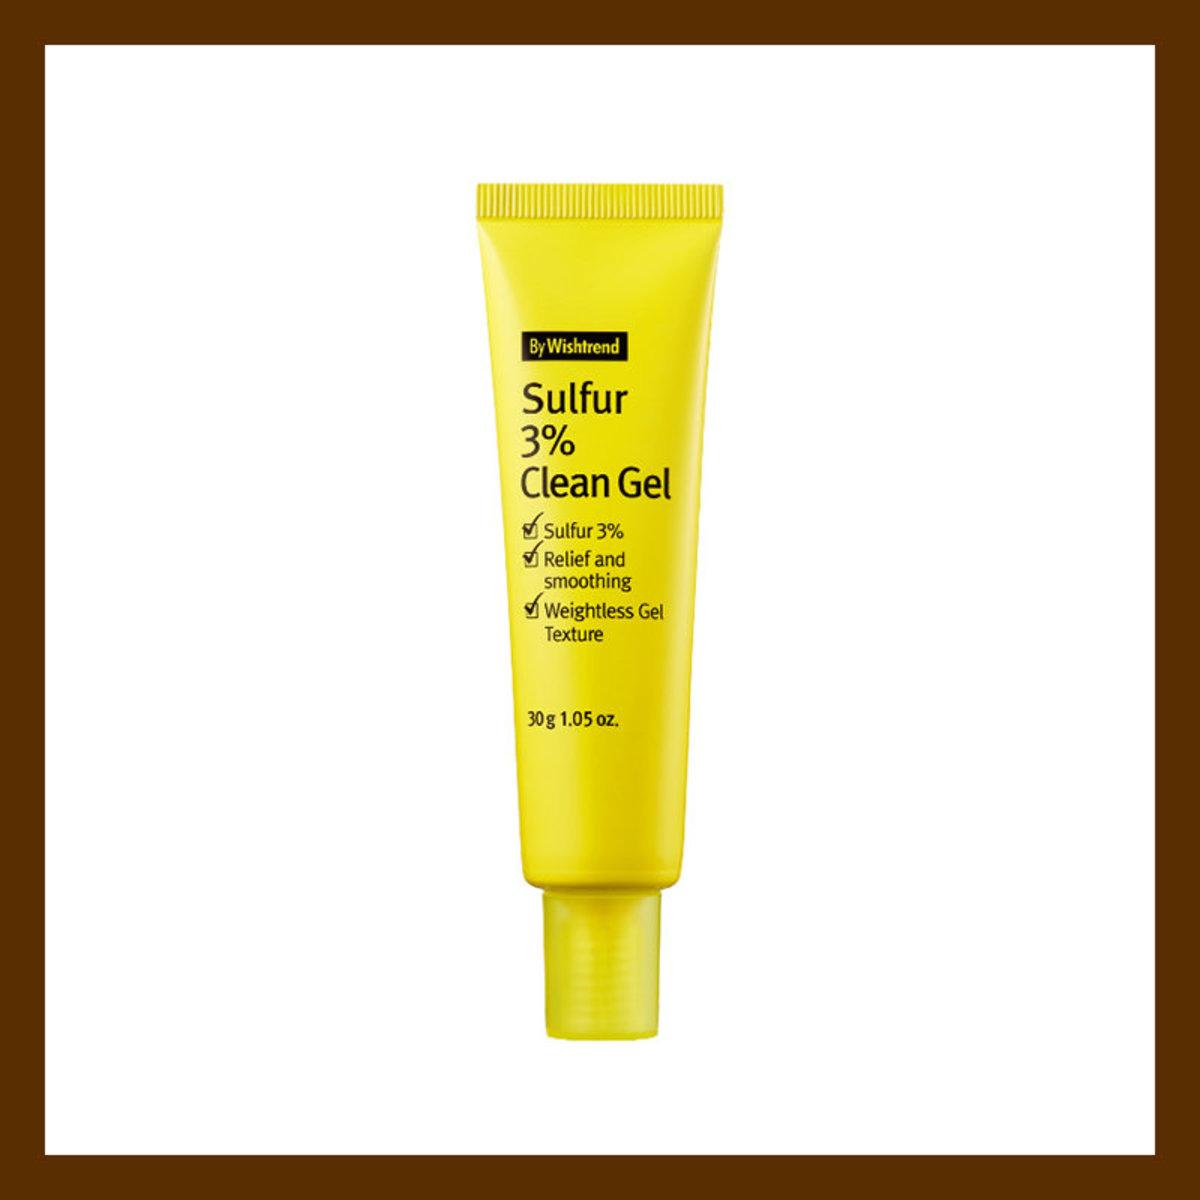 BY WISHTREND Sulfur 3% Clean Gel 3%硫磺抗痘o者喱 30g